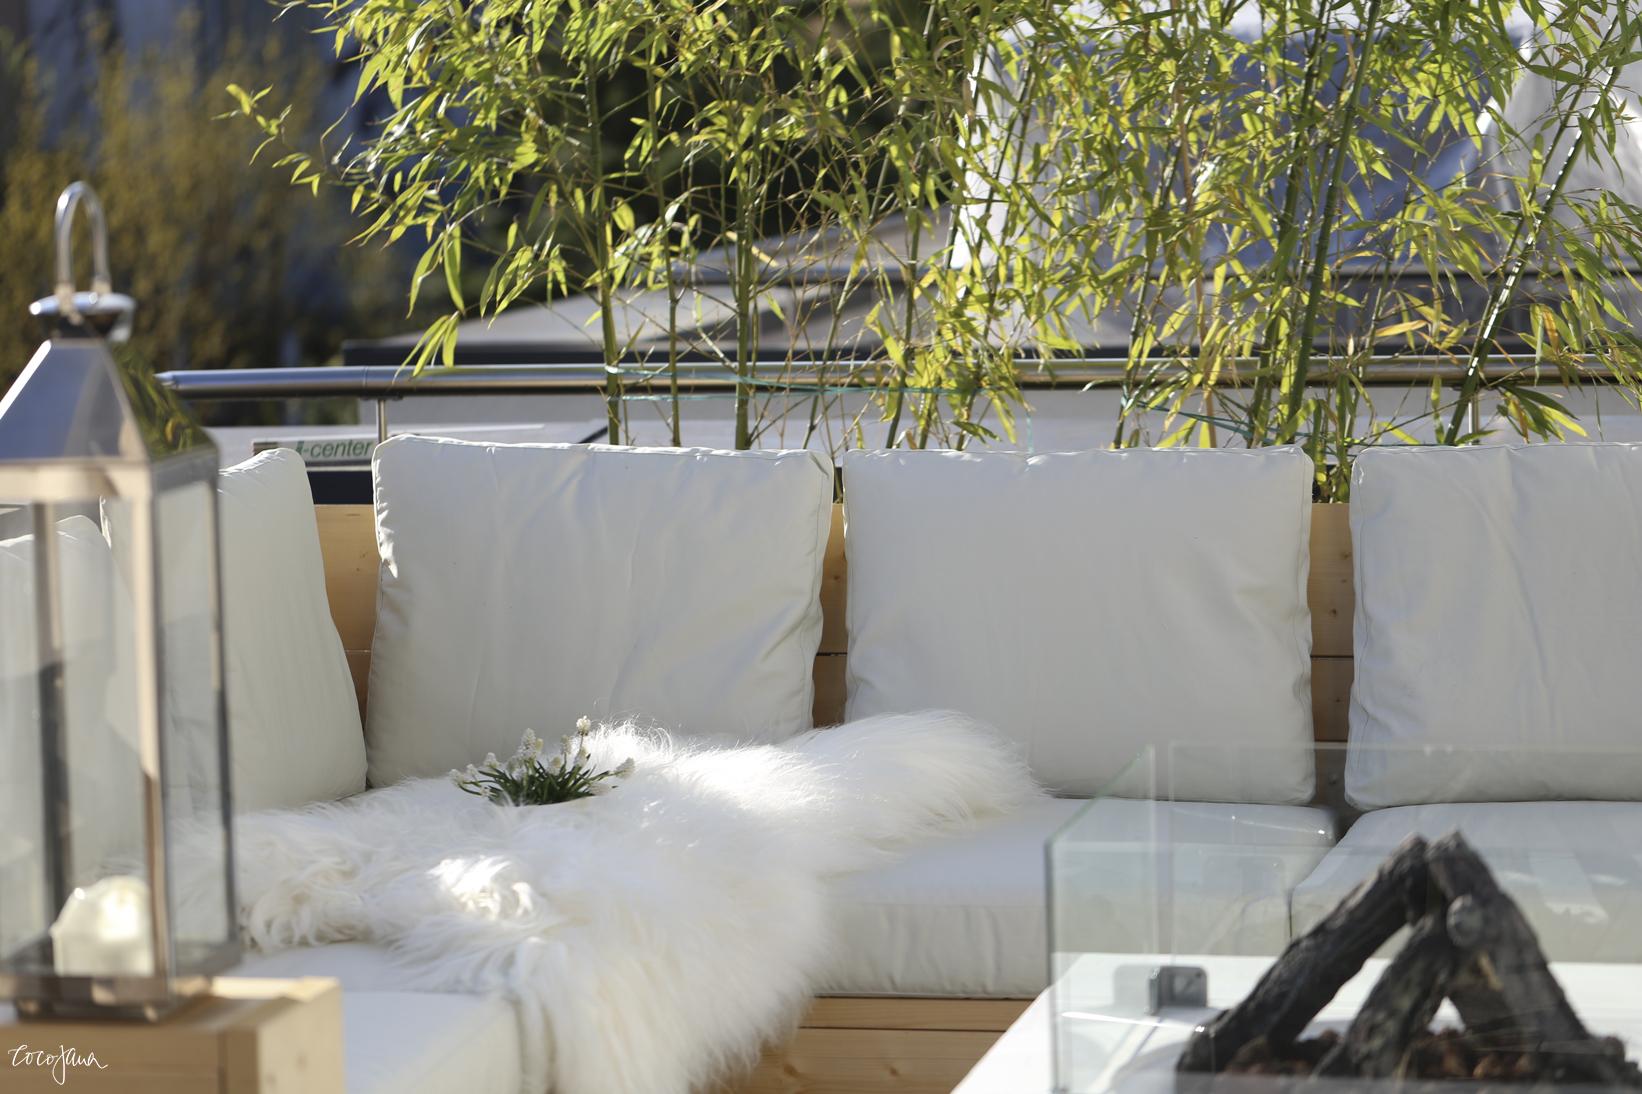 Full Size of Loungemöbel Balkon Diy Loungembel Selber Bauen Planungswelten Garten Günstig Holz Wohnzimmer Loungemöbel Balkon